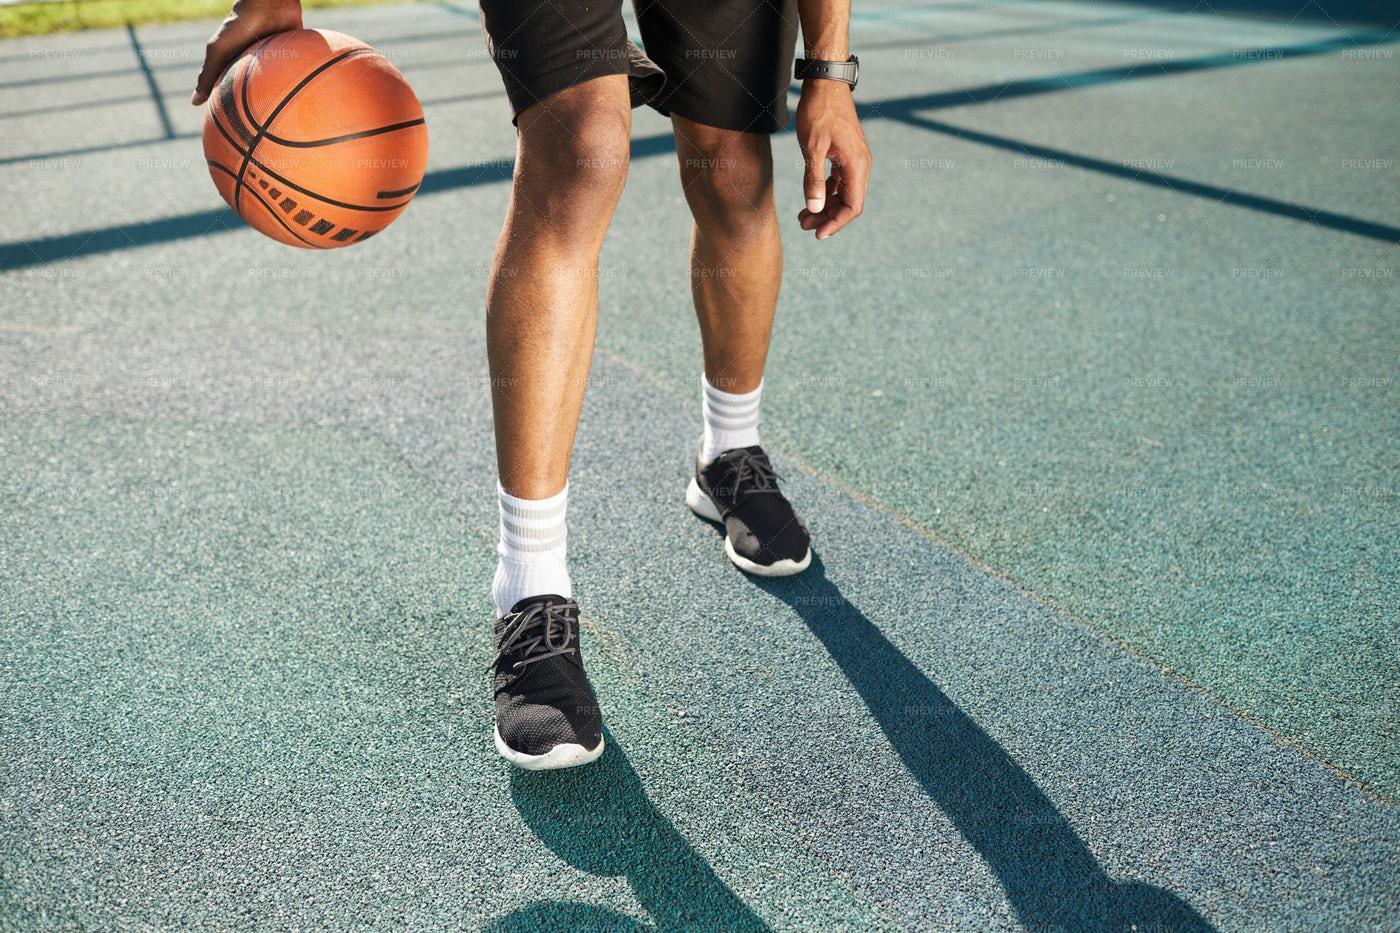 Legs Of Basketball Player: Stock Photos